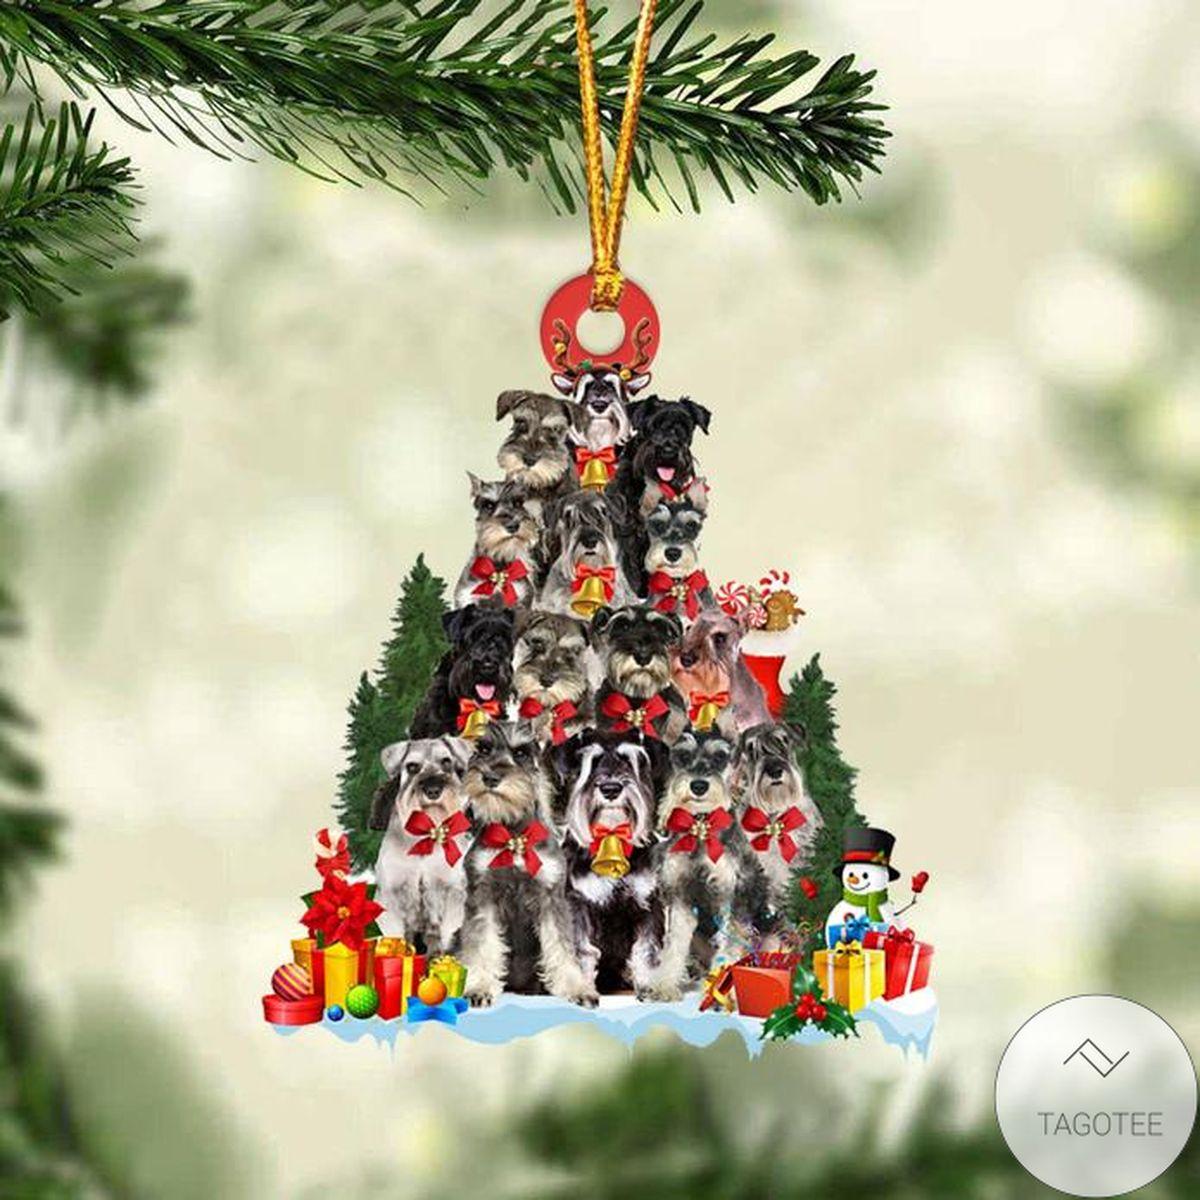 Miniature Schnauzer Dog Christmas Tree Ornament